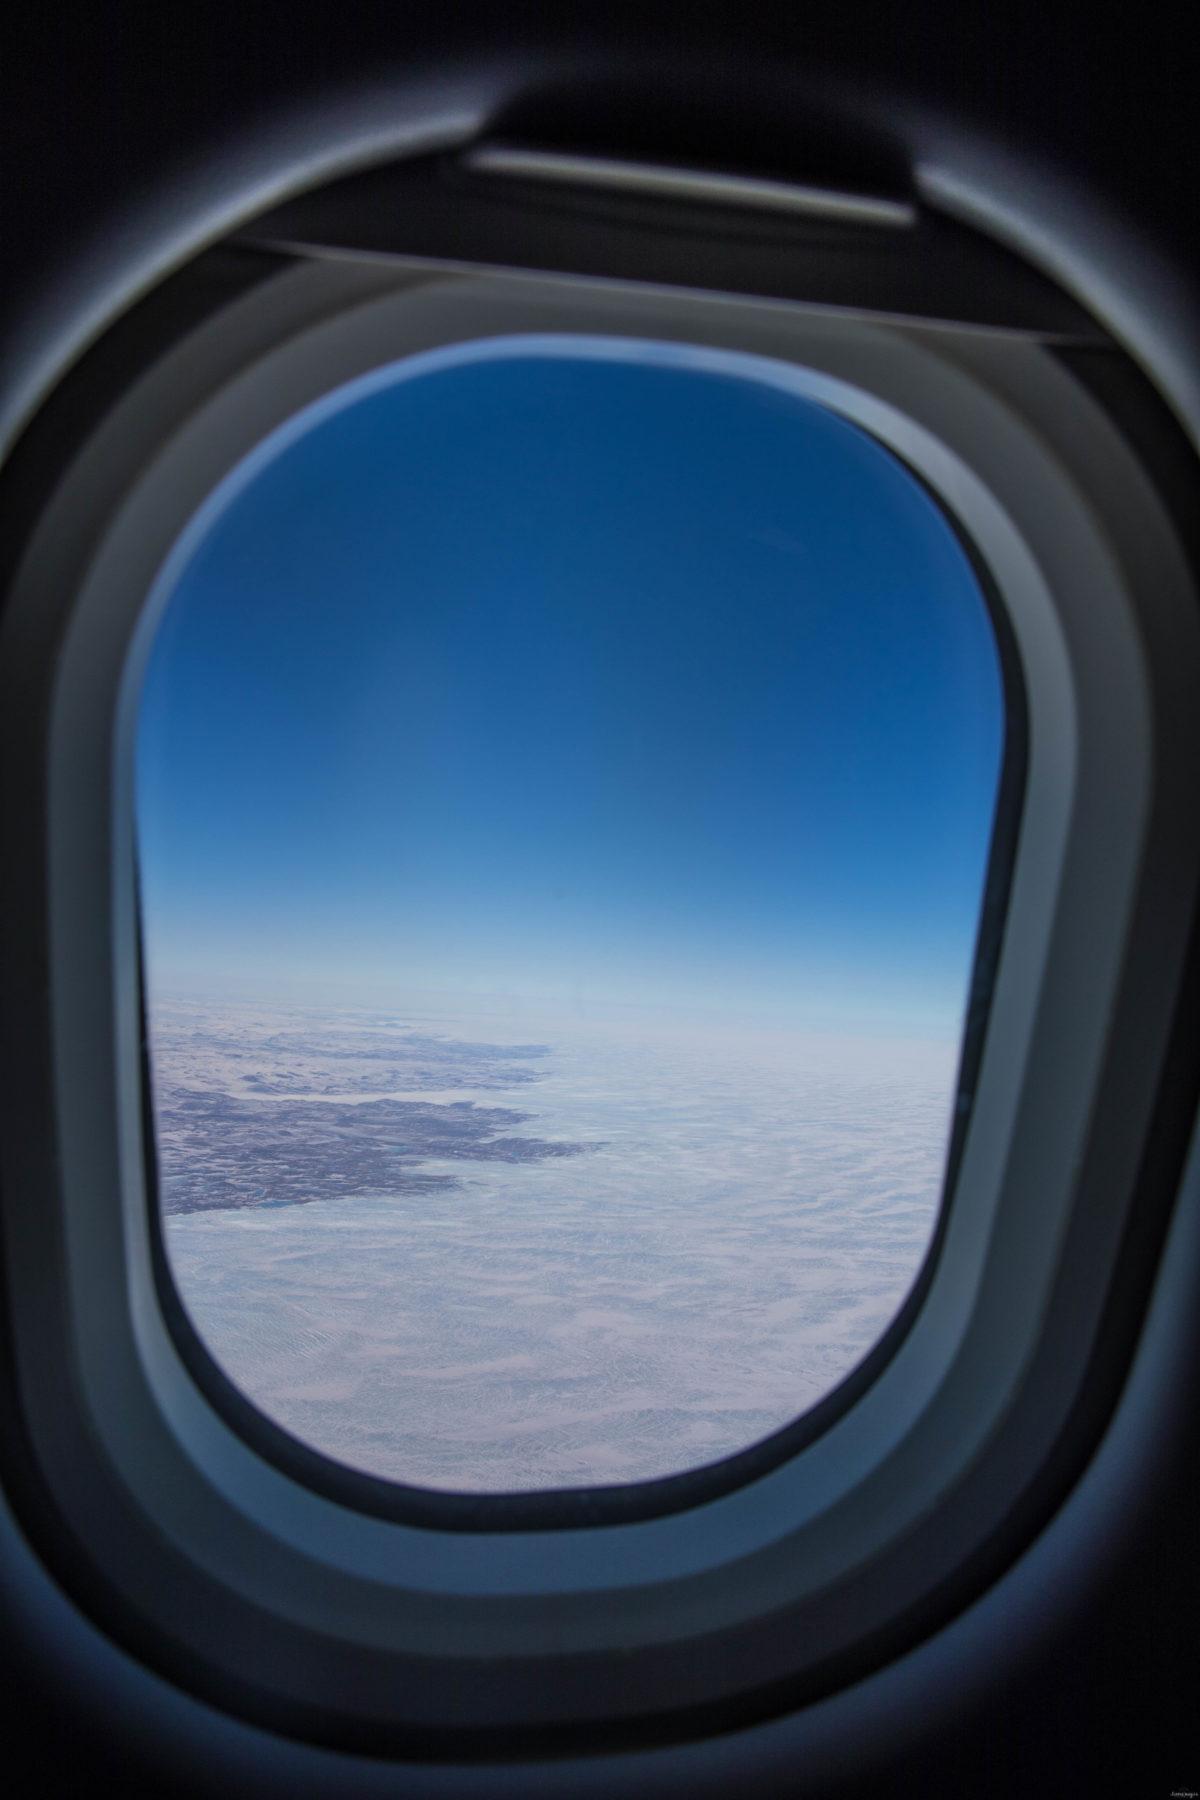 Aller au Groenland avec Air Greenland